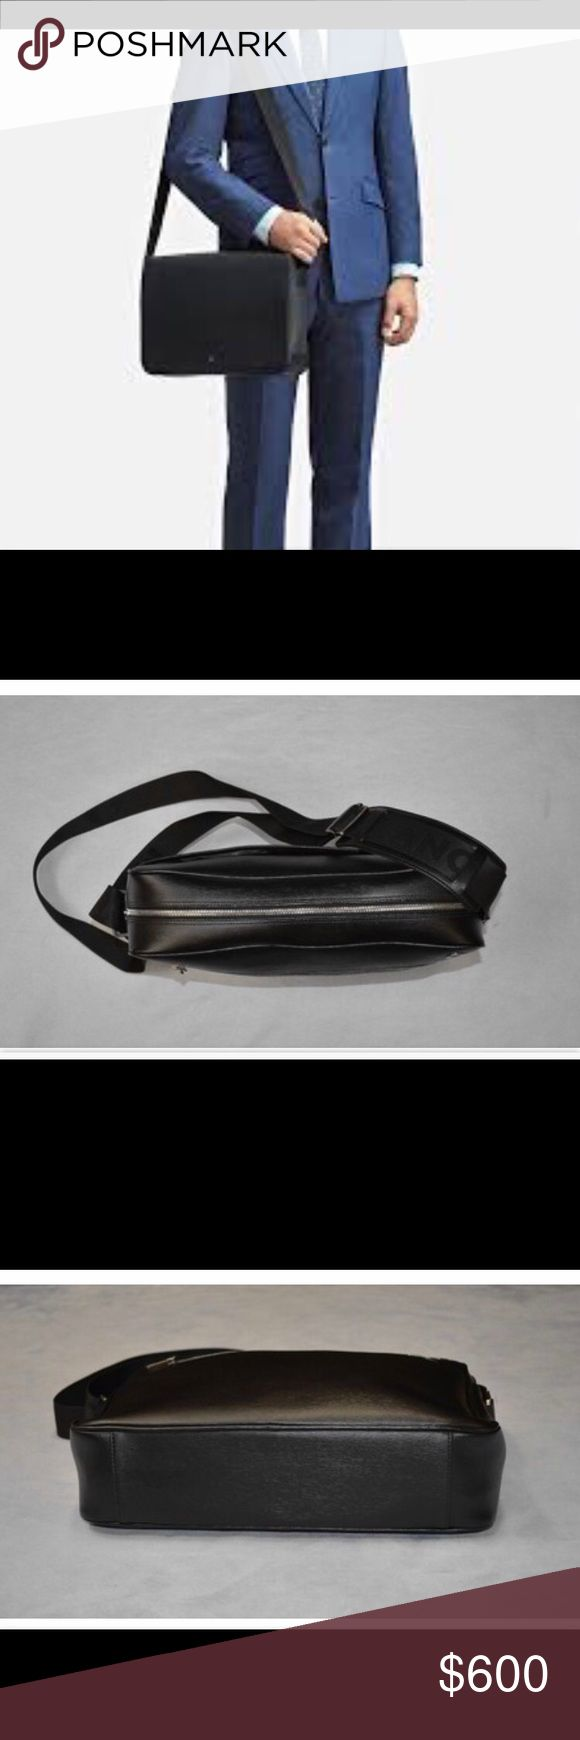 Mont Blanc Platinum Leather Messenger Bag Platinum Leather Collection Messenger bag with genuine leather, inside zipper, middle laptop compartment, adjustable shoulder strap, hidden magnets closure, palladium-coated fittings and Montblanc name and emblem with palladium-coated ring Montblanc Bags Shoulder Bags